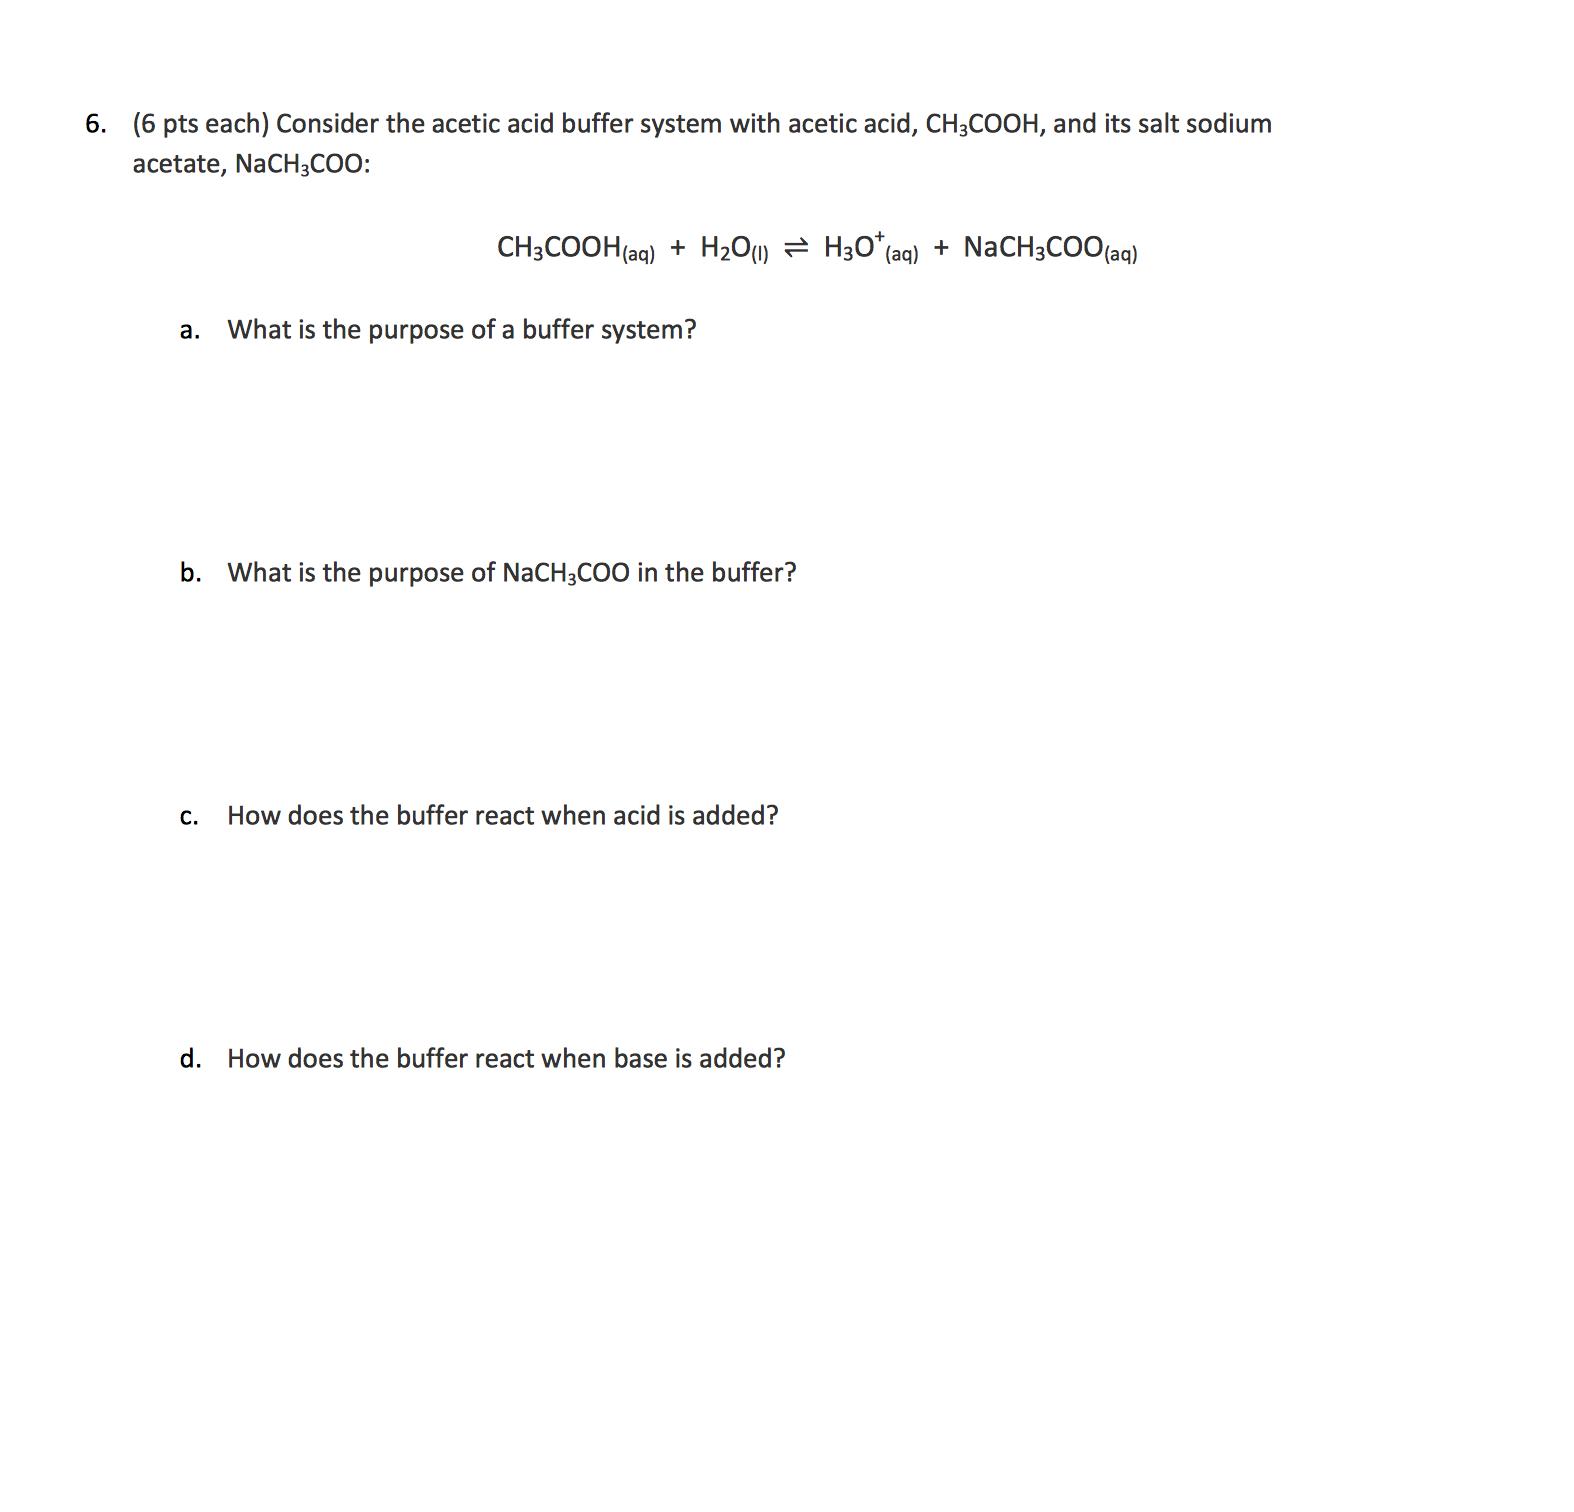 6. (6 Pts Each) Consider The Acetic Acid Buffer Sy... | Chegg.com